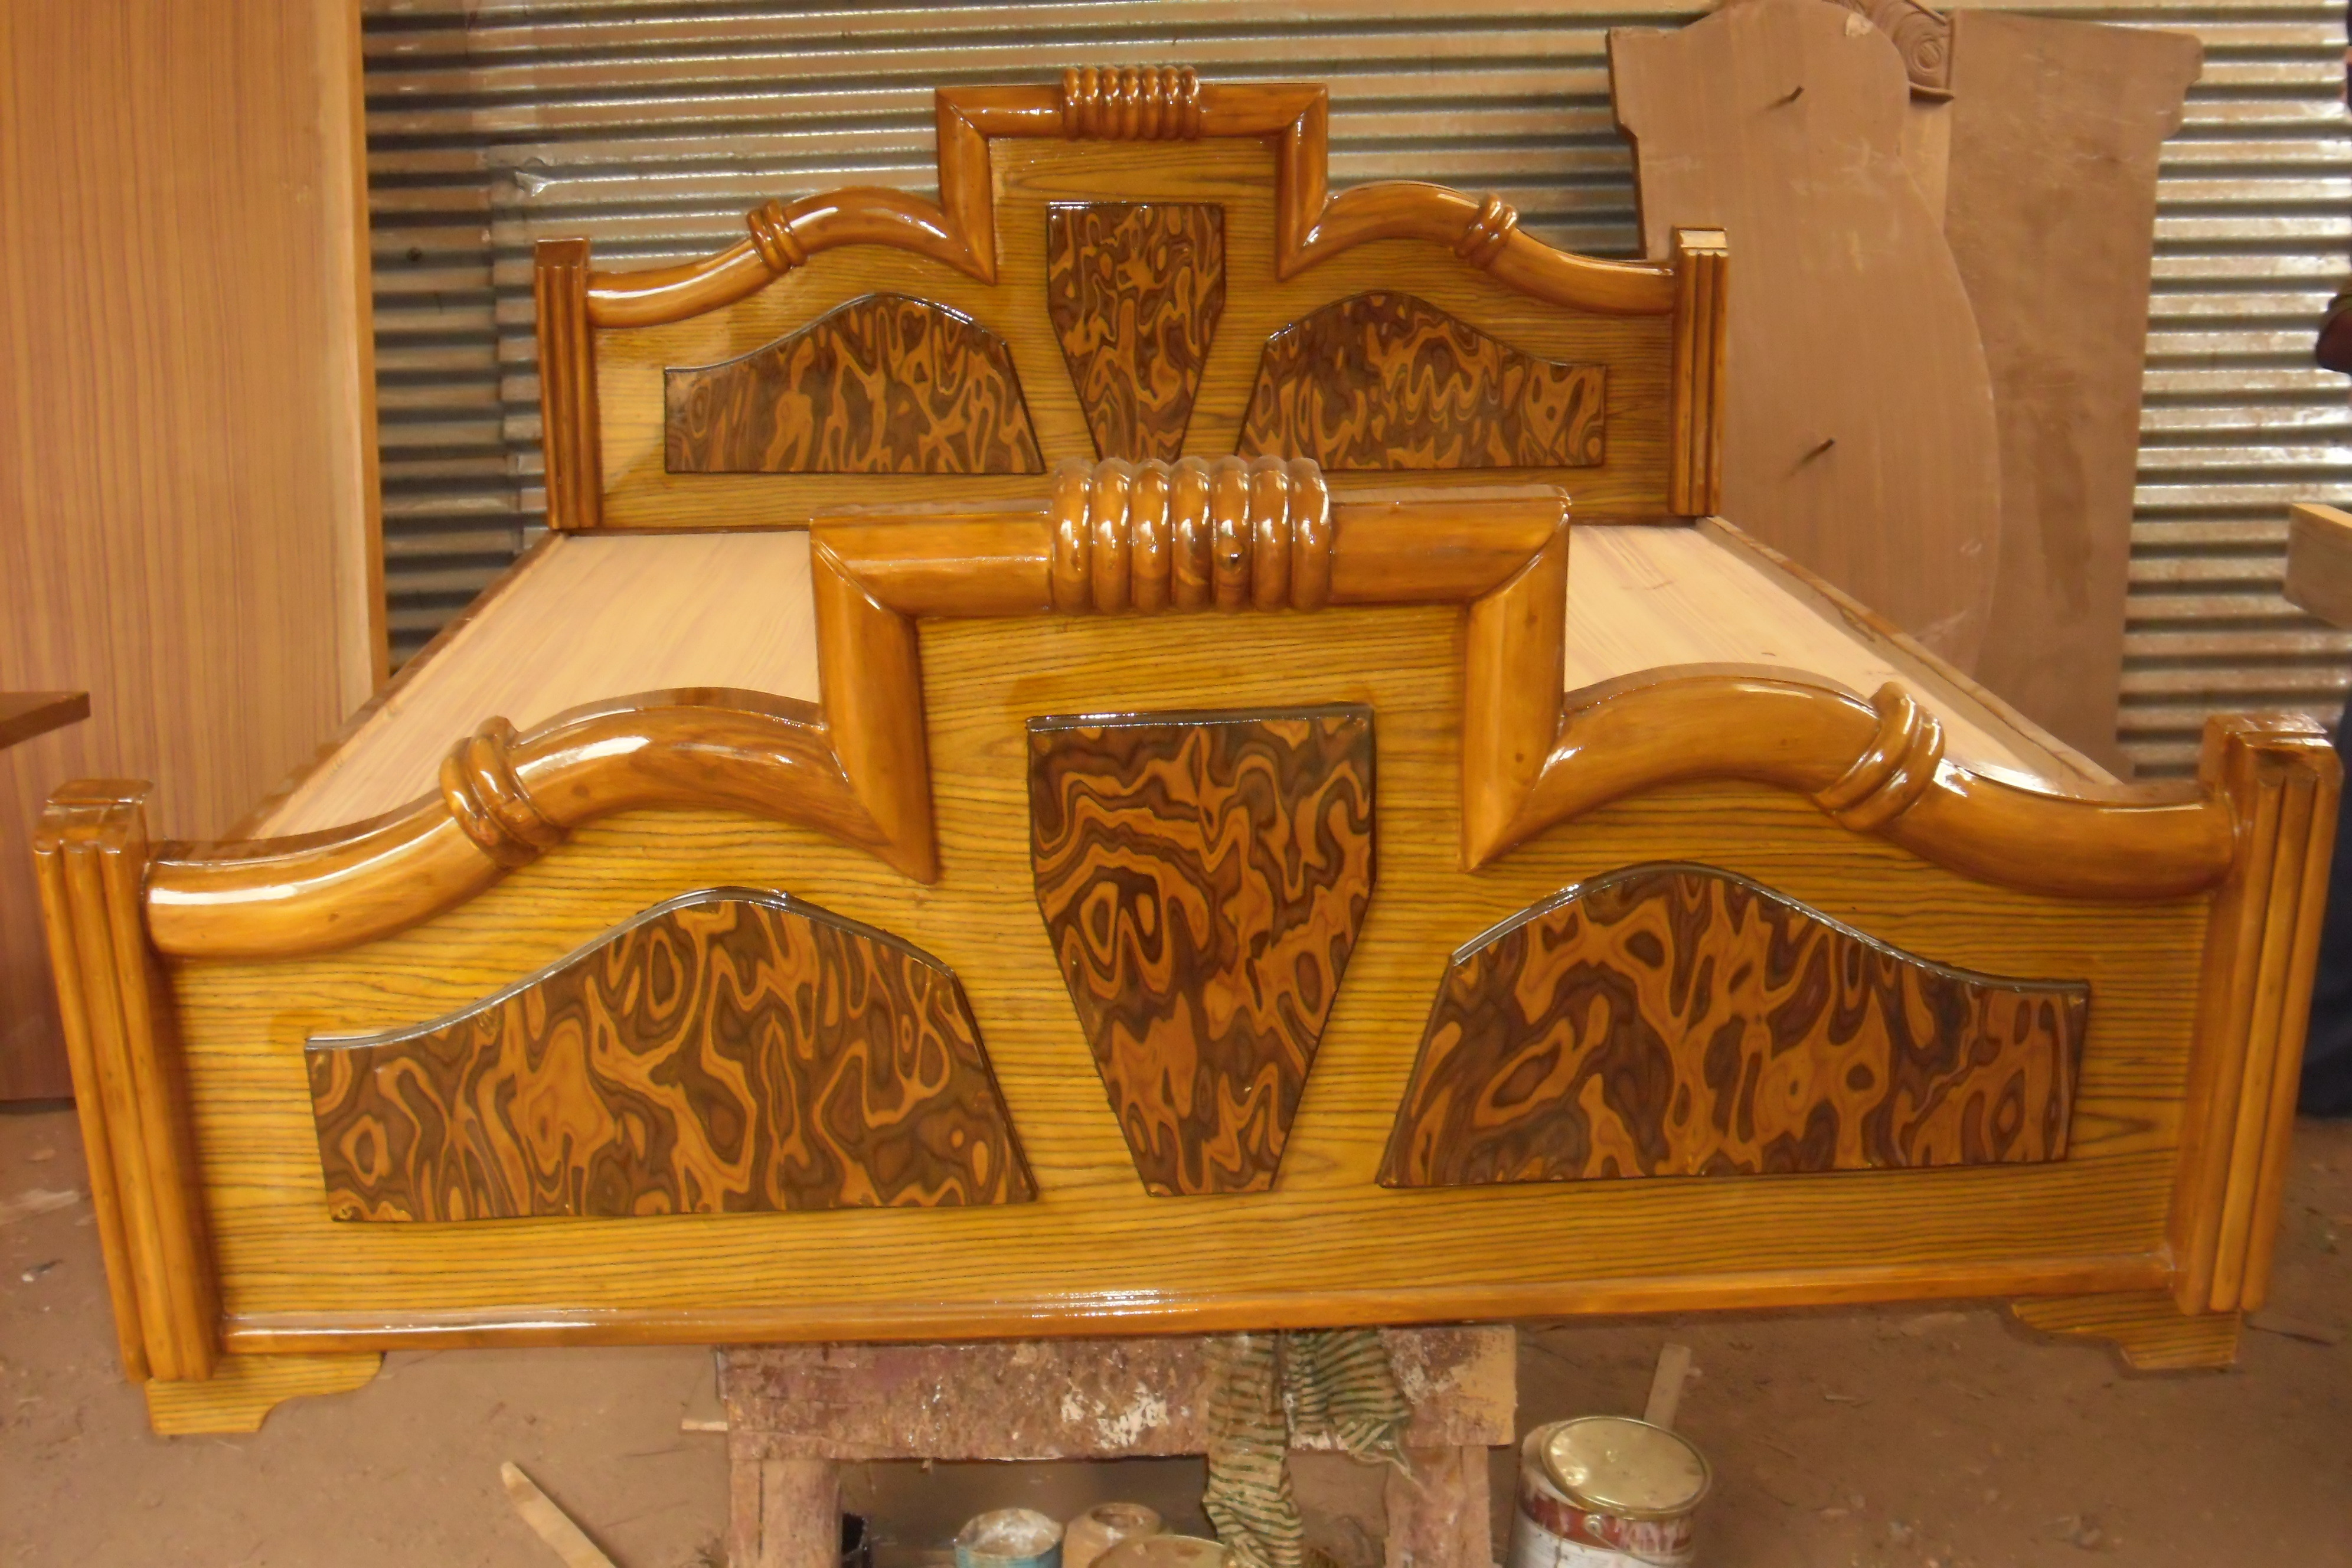 Sree Balaji Modular Furniture, Coimbatore